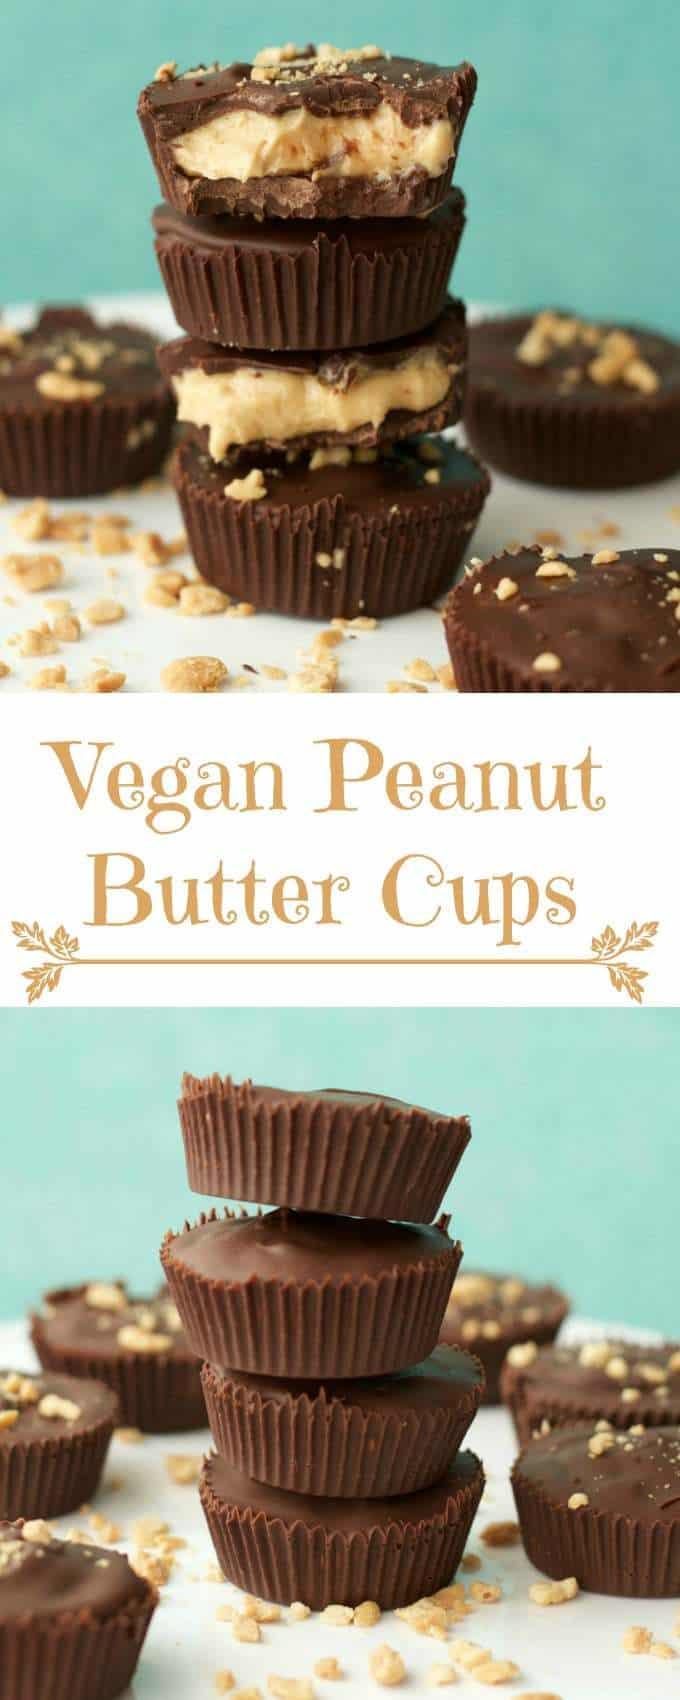 Vegan Peanut Butter Cups #vegan #lovingitvegan #dairyfree #dessert #peanutbuttercups